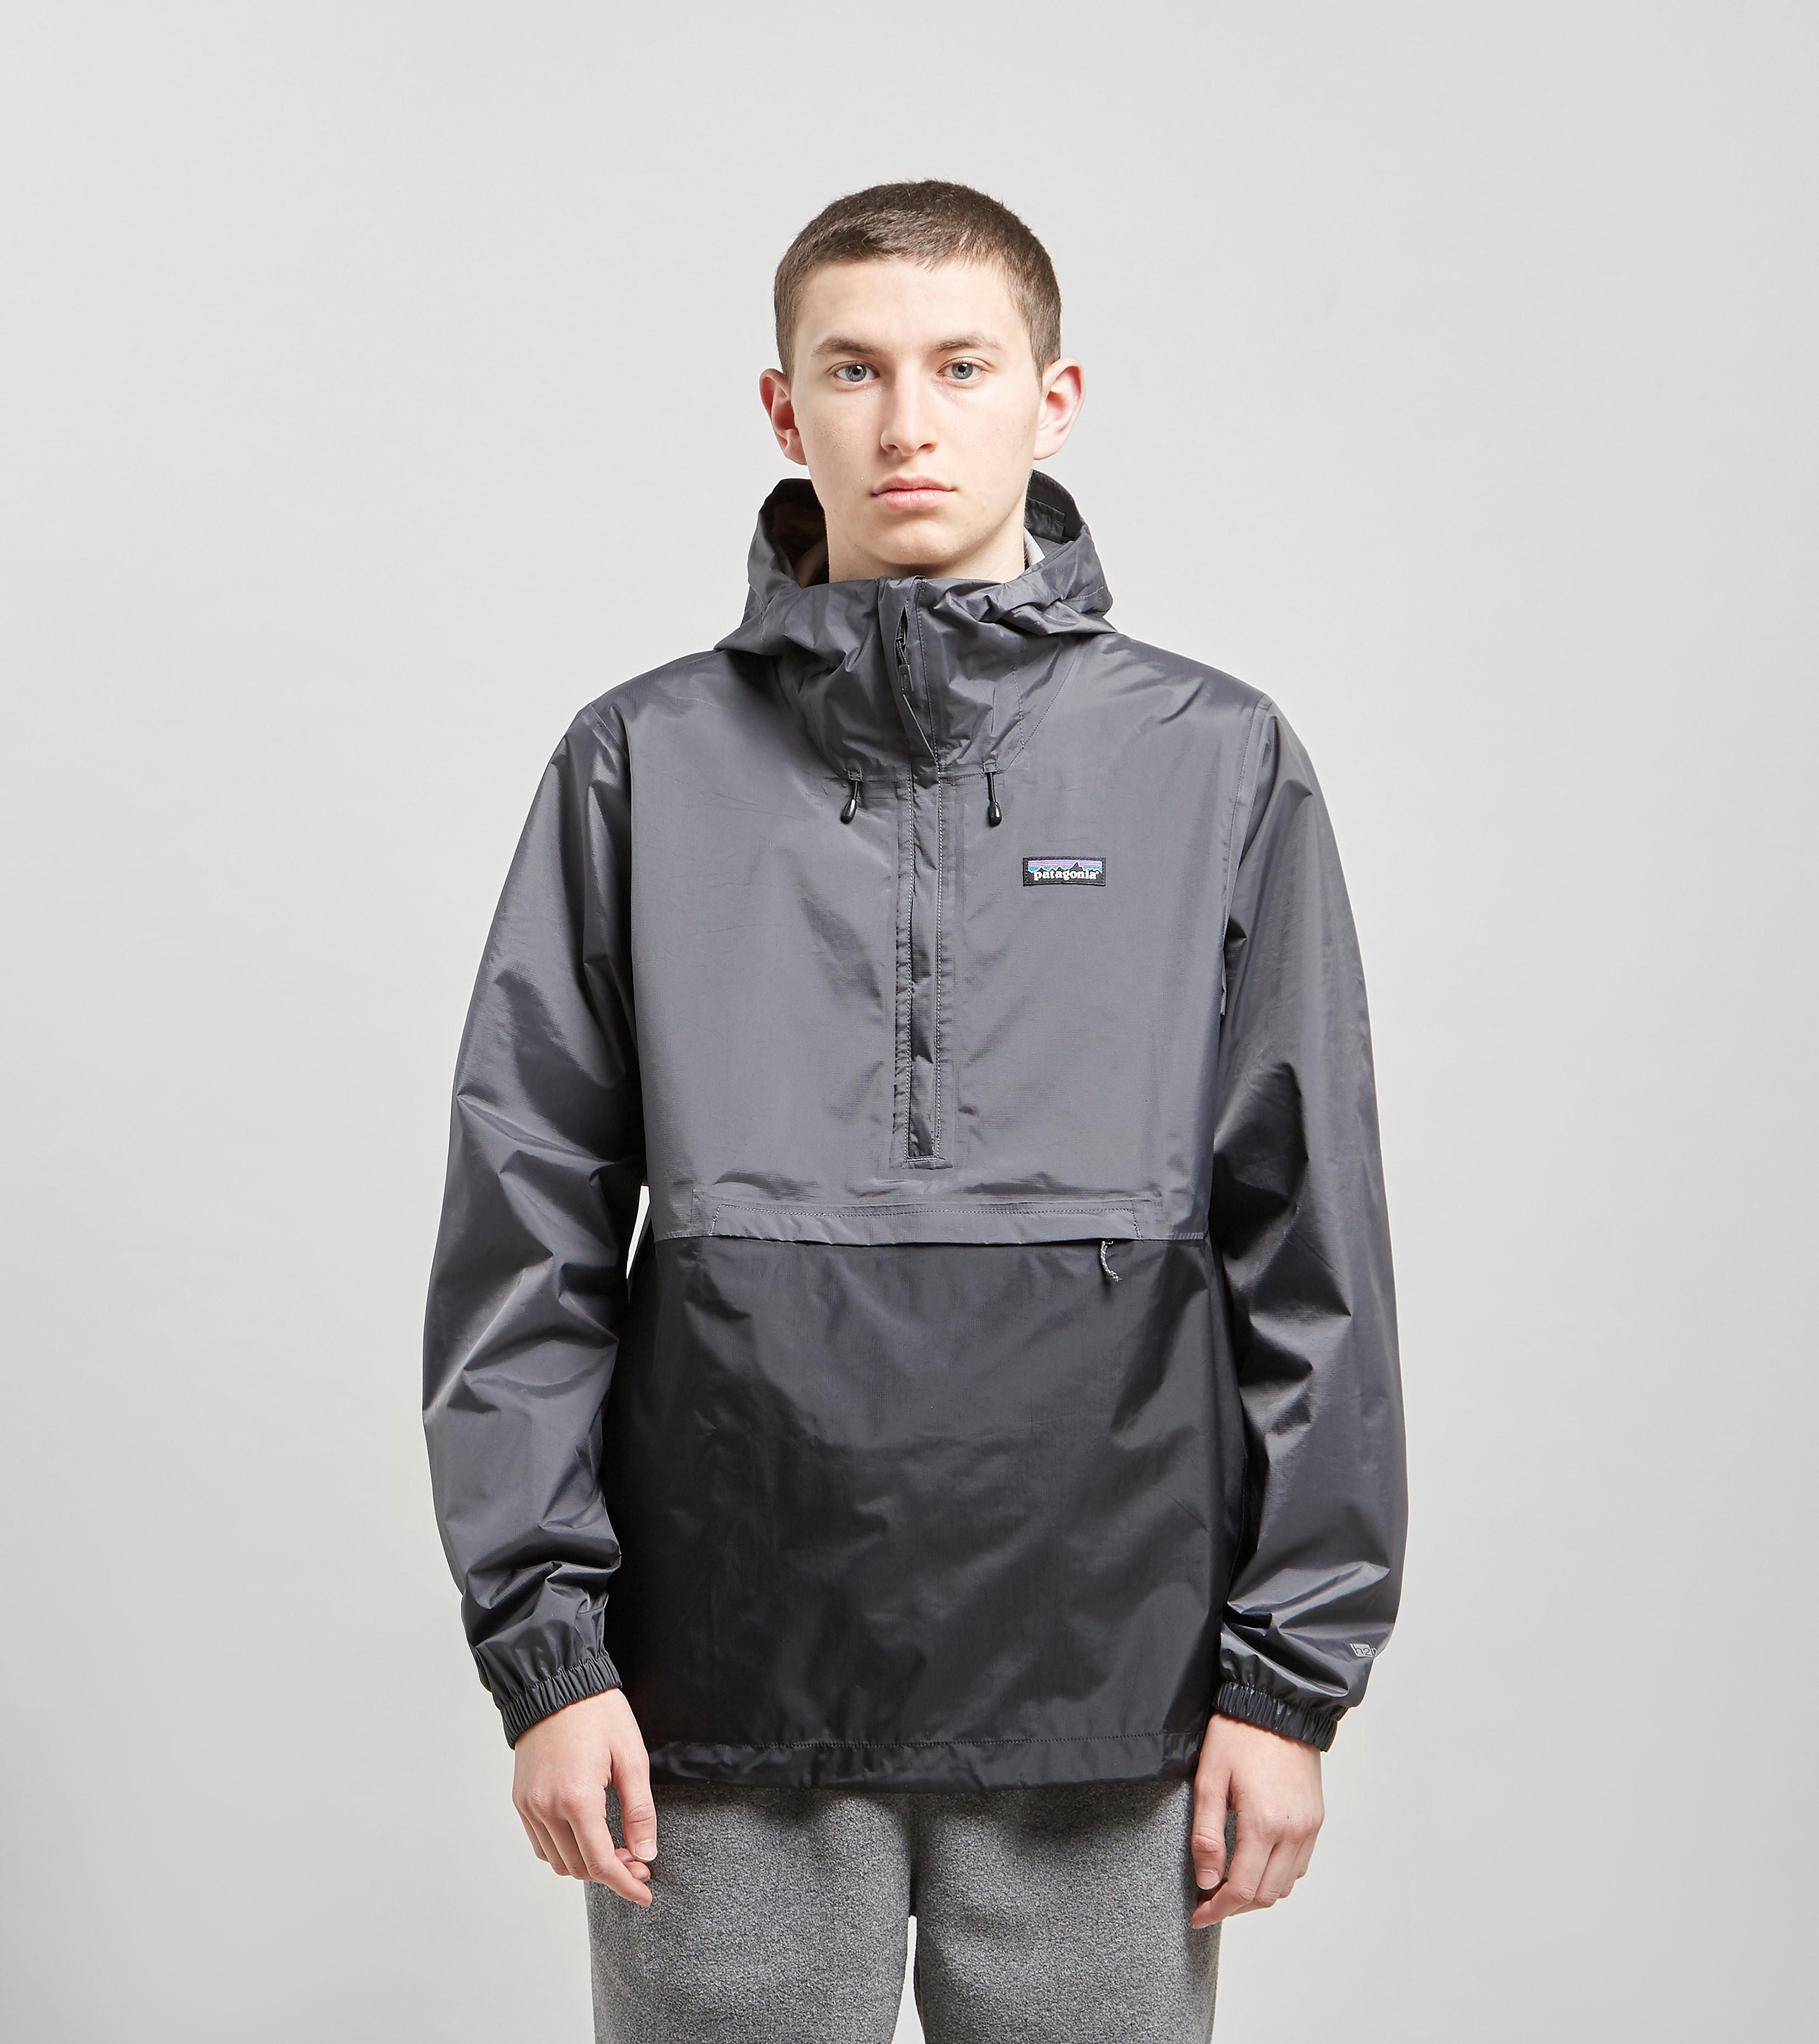 Patagonia Torrentshell Jacket Grey